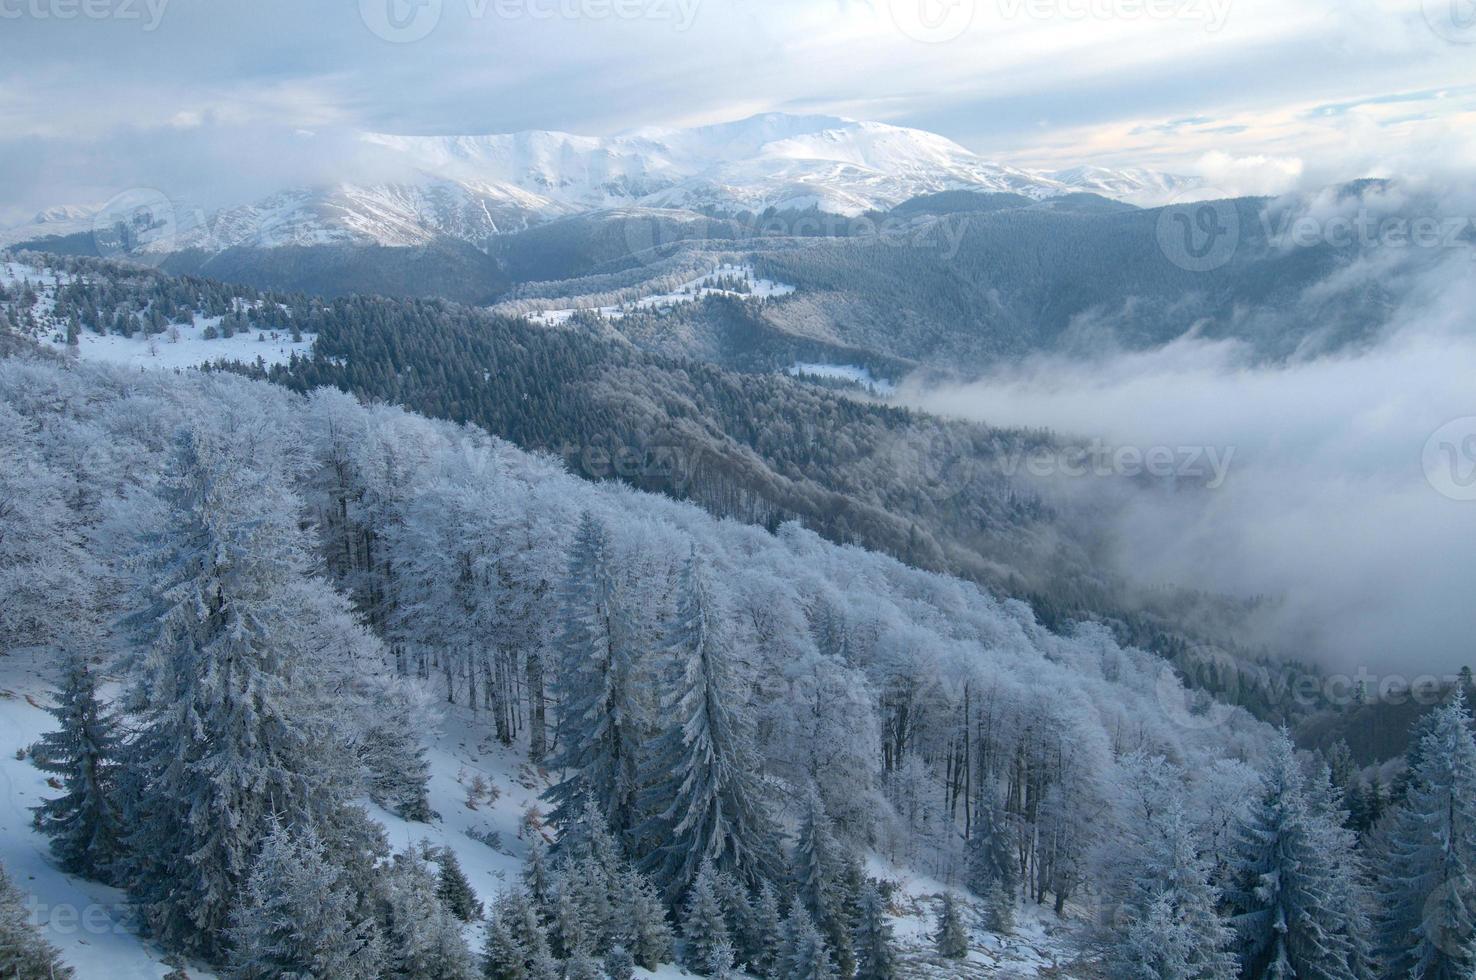 Mountain scenery in winter photo